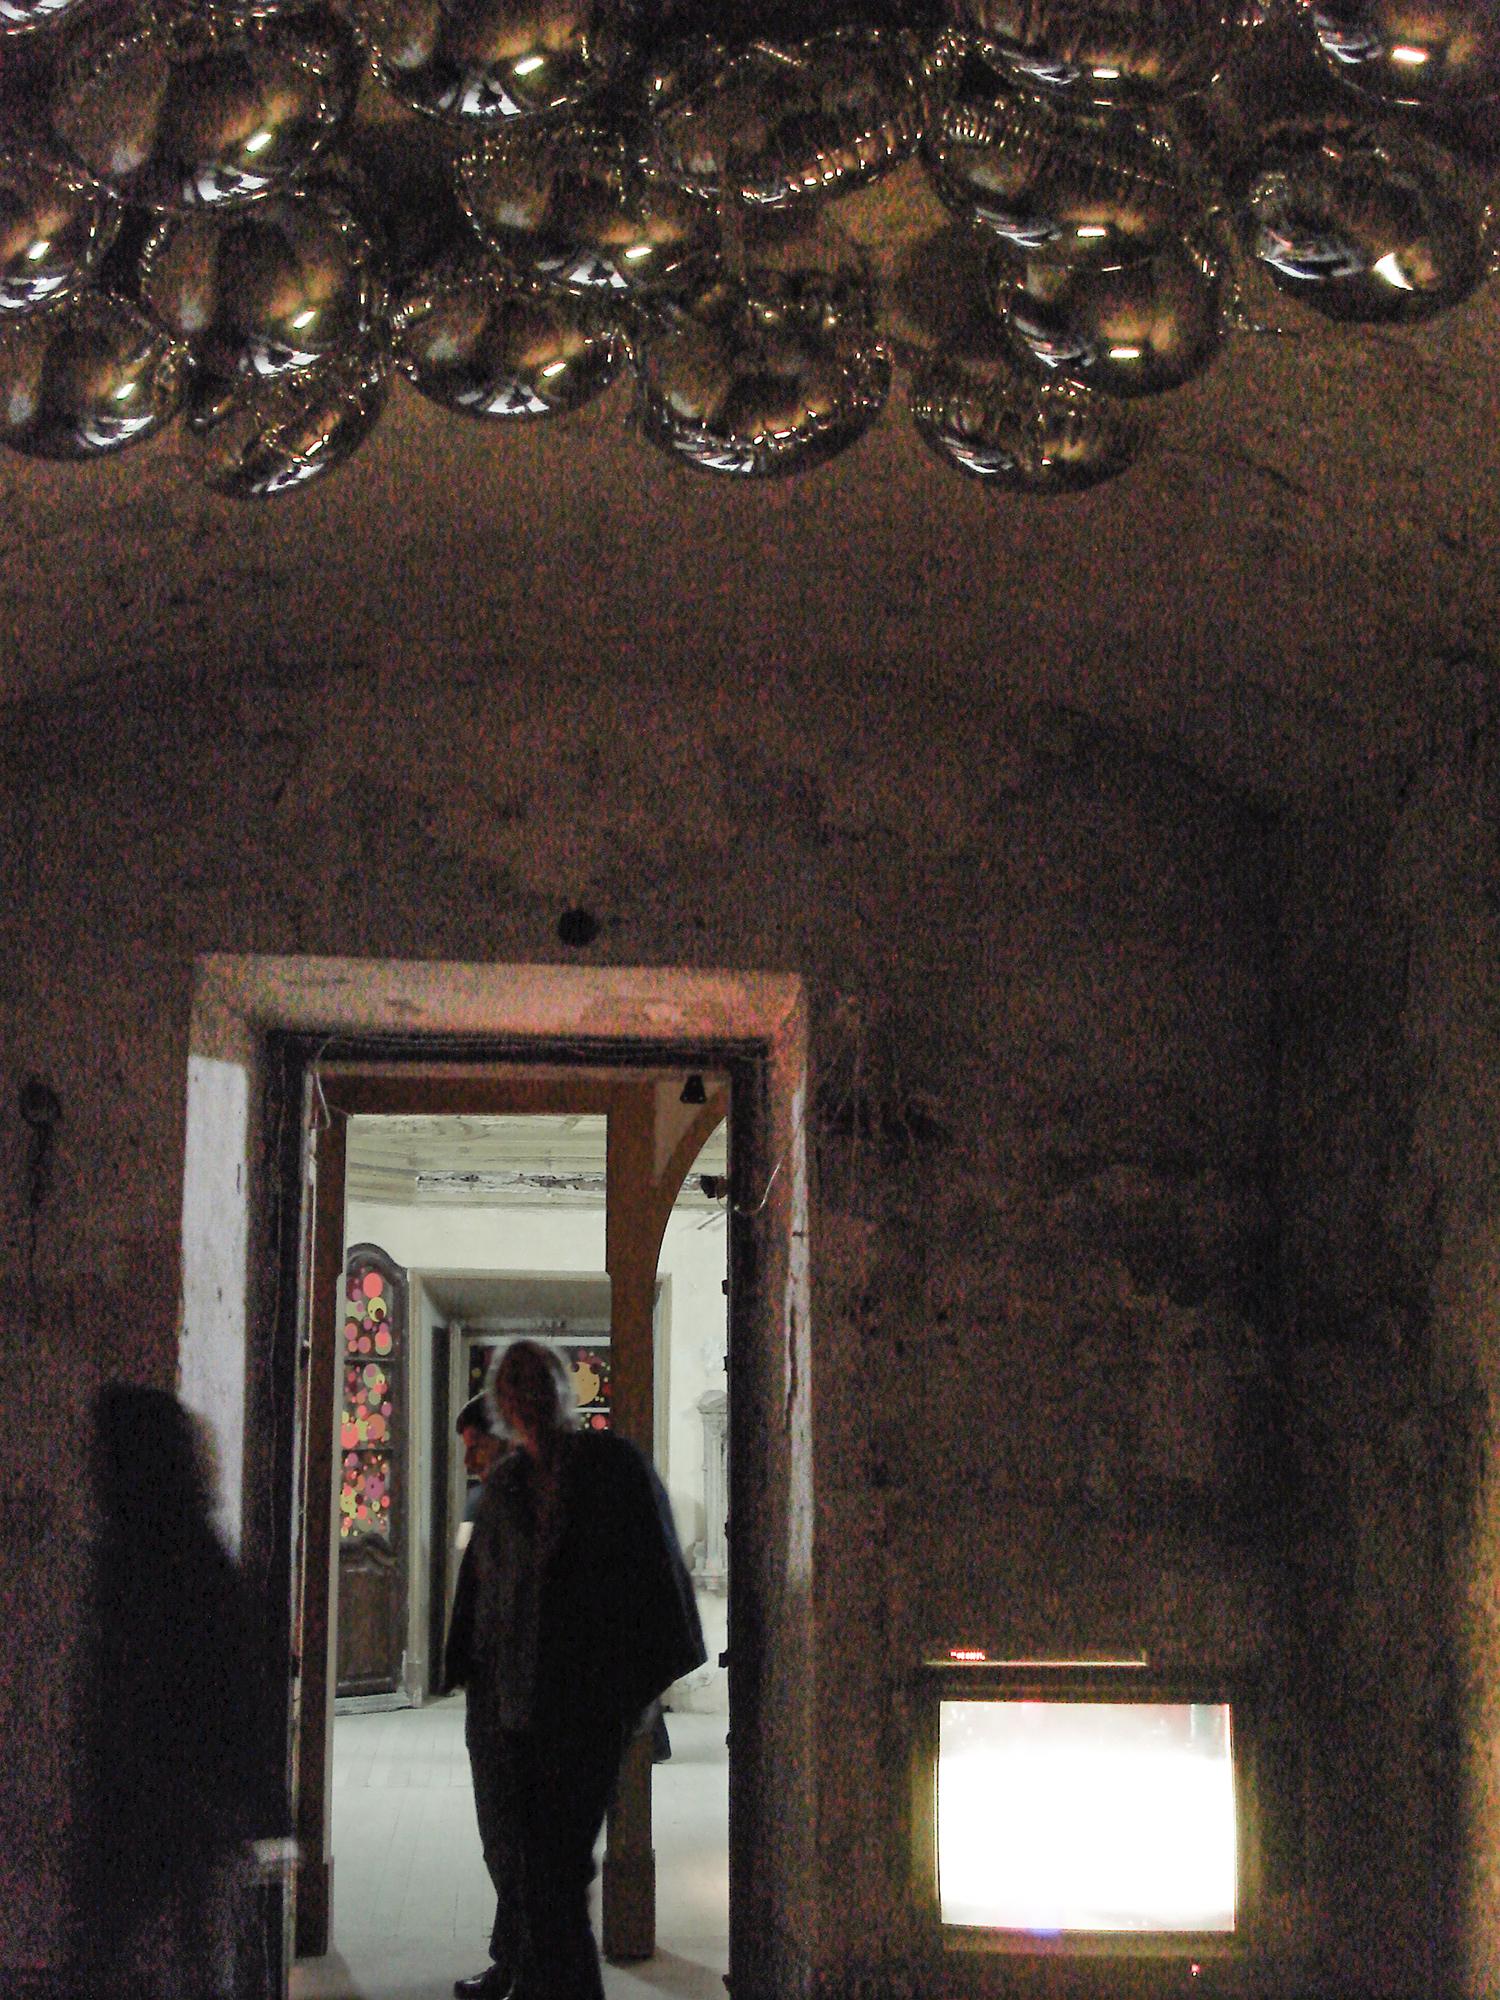 Entre Tempos  :group show at  Carpe Diem Arte e Pesquisa cultural center in  Lisbon, Portugal, September through November 2009.  Coordination Albano Afonso and Sandra Cinto. Curatorship by Paulo Reis.  Work shown: Entretempos.